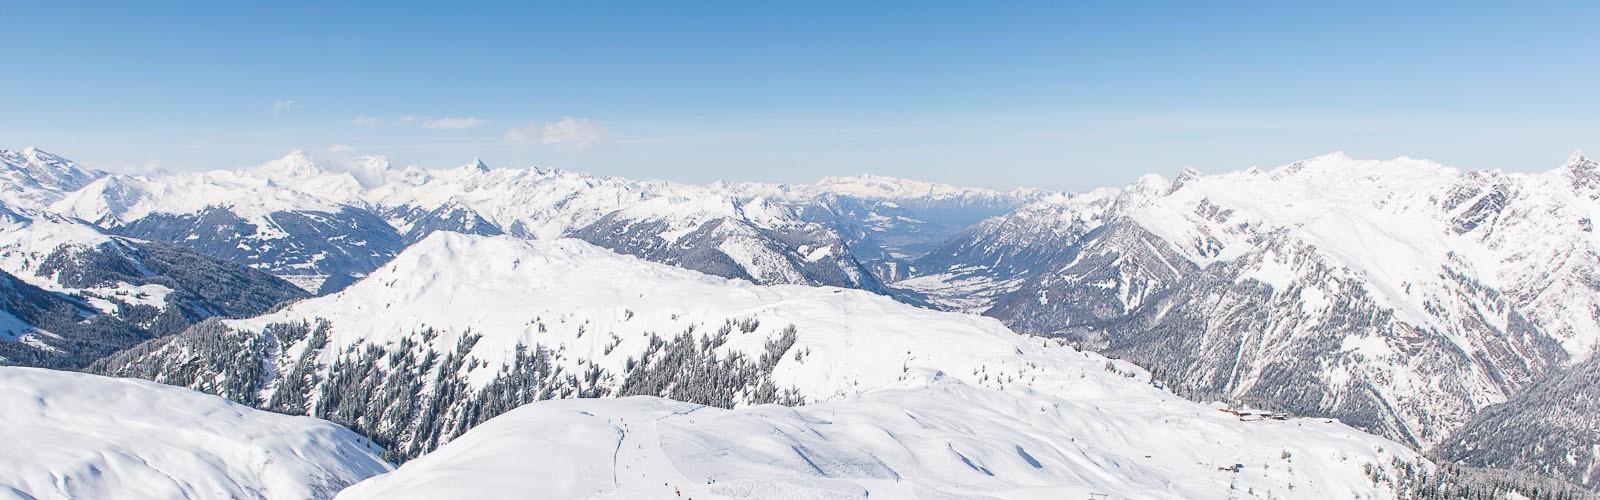 arlberg chalets wald am arlberg